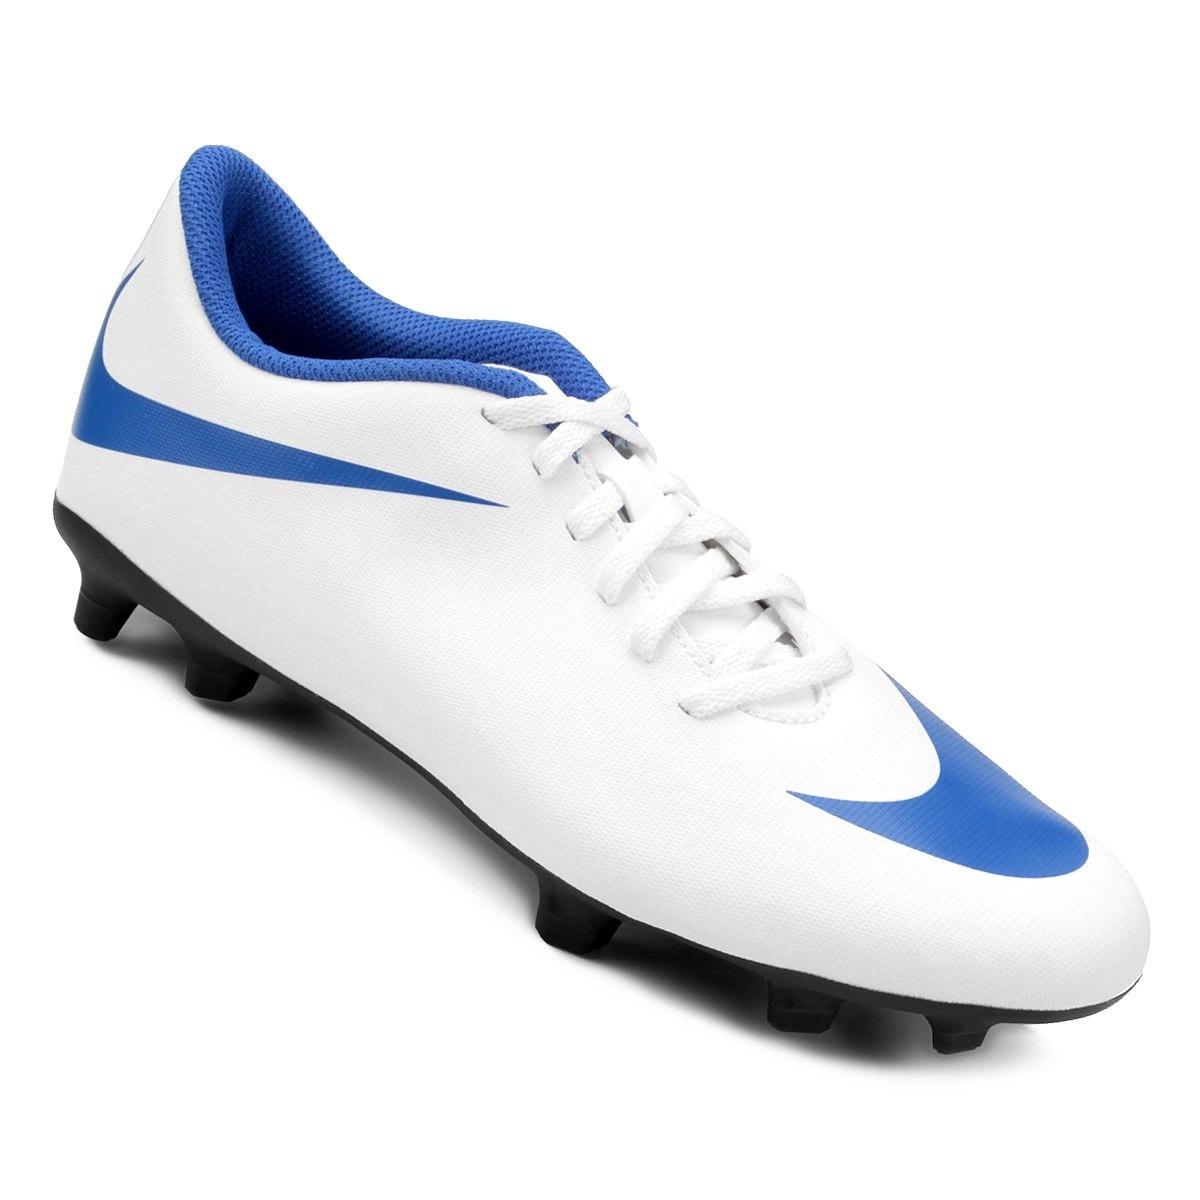 741b77a7e4 Chuteira Nike Campo Bravata Ii - Original - R  229